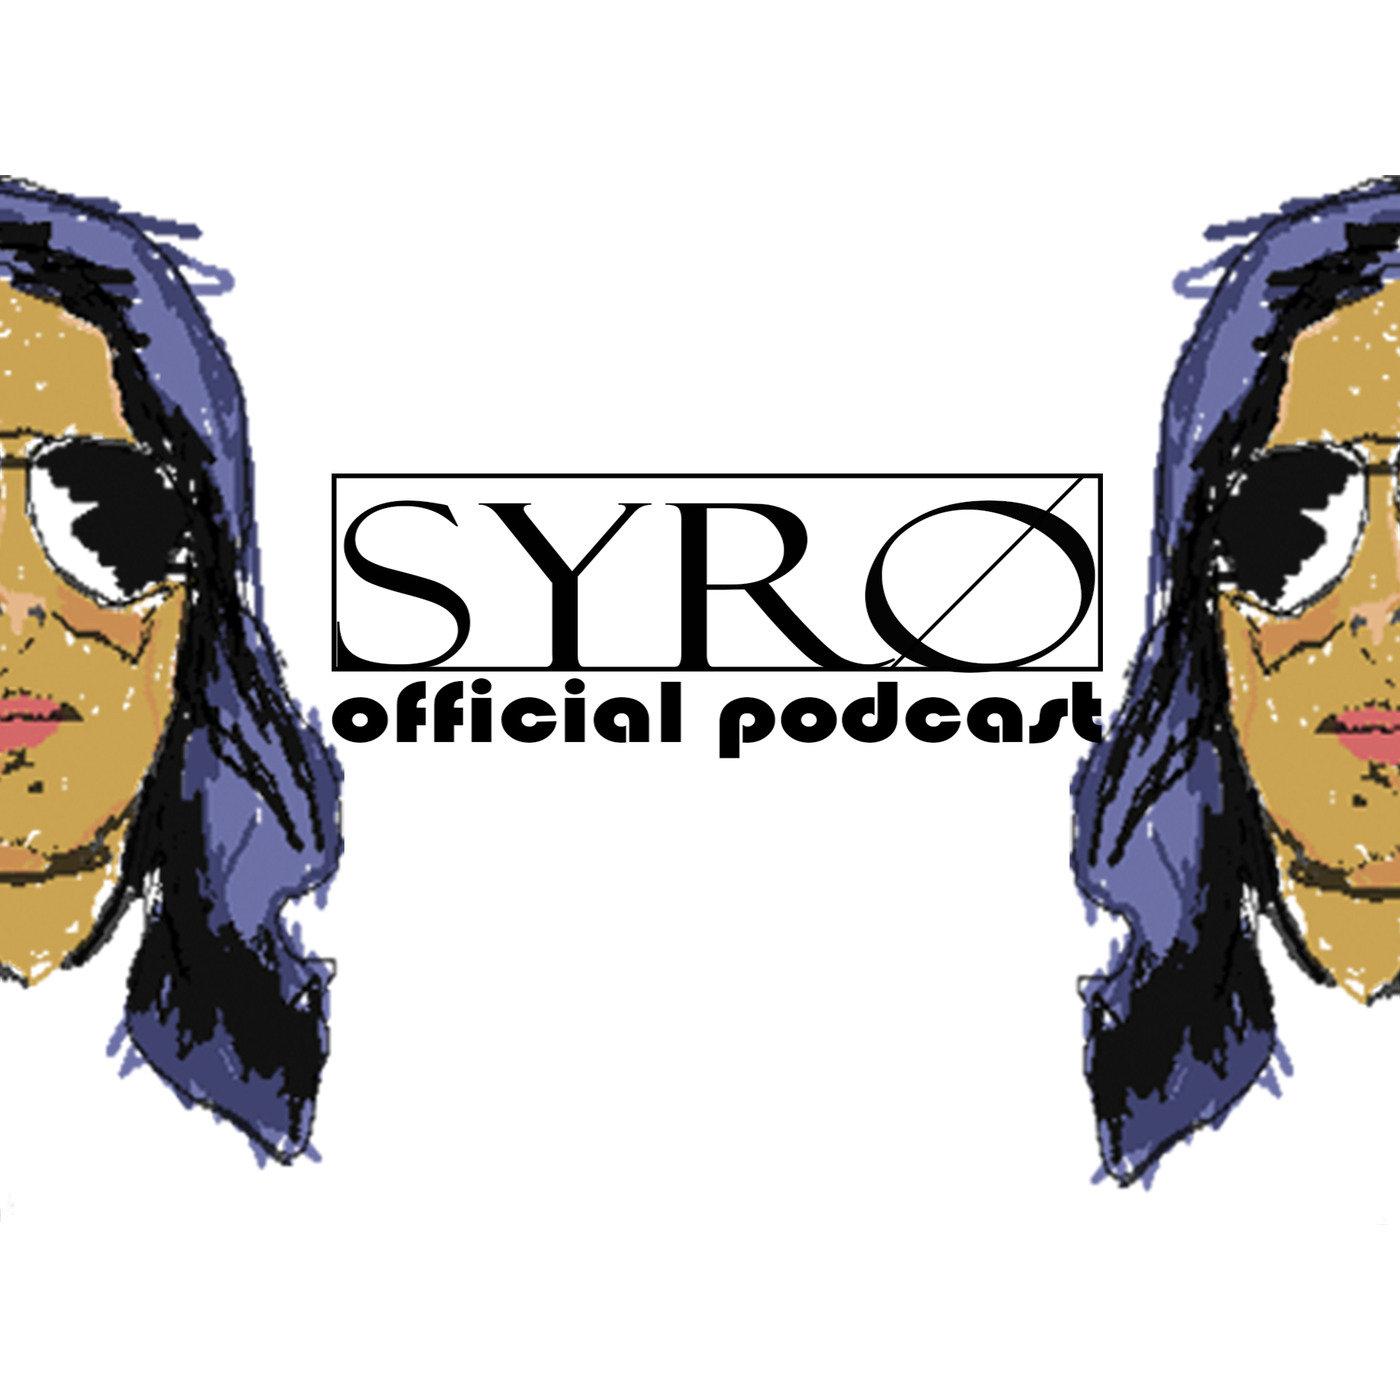 <![CDATA[Syrø Official ]]>